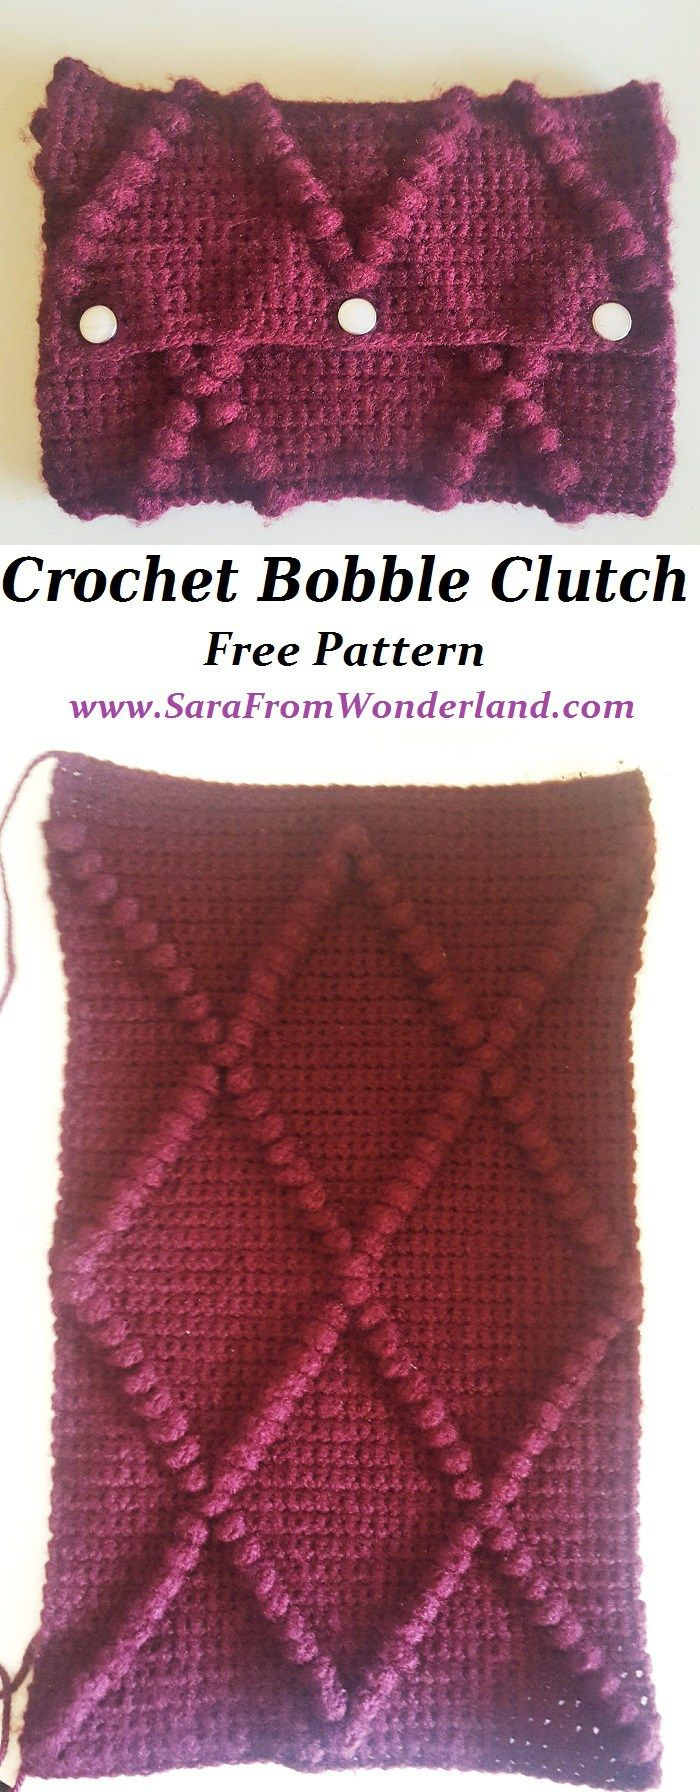 [FREE PATTERN] Crochet this cute Bobble Clutch